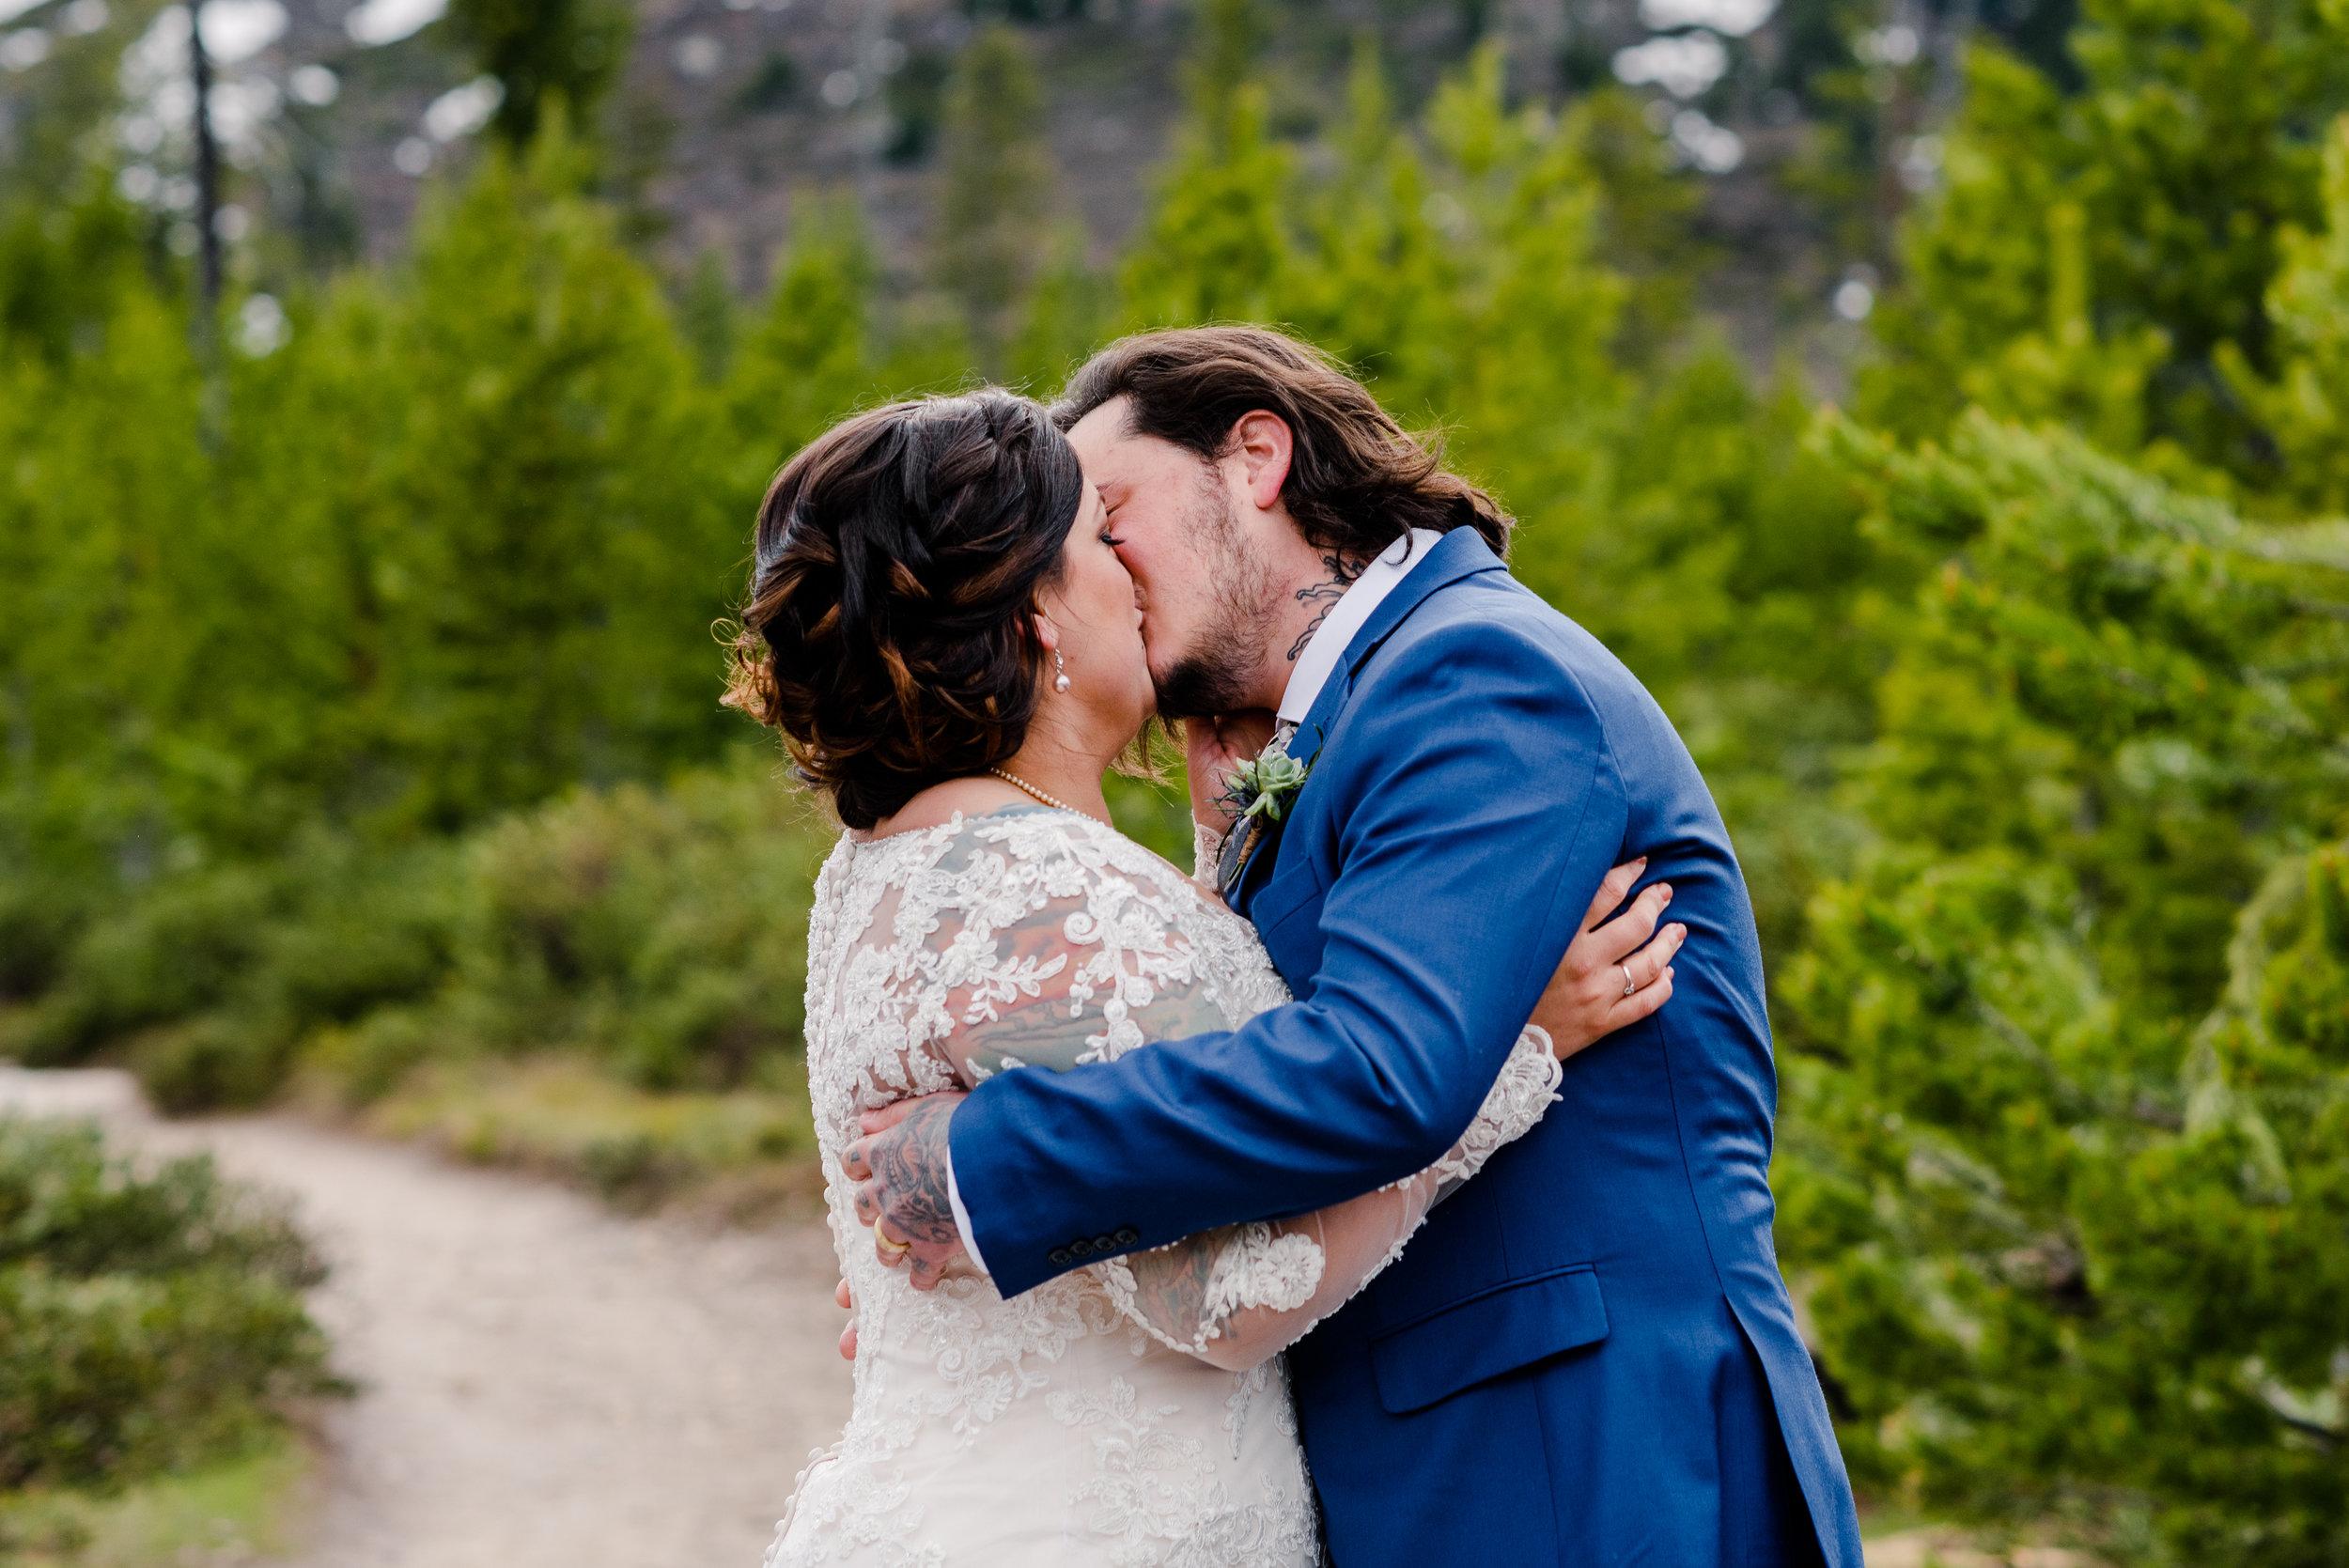 Lyndsay & Sean Wedding_Wyoming Wedding Photographer [Virginia Ruth Photography]-244.jpg